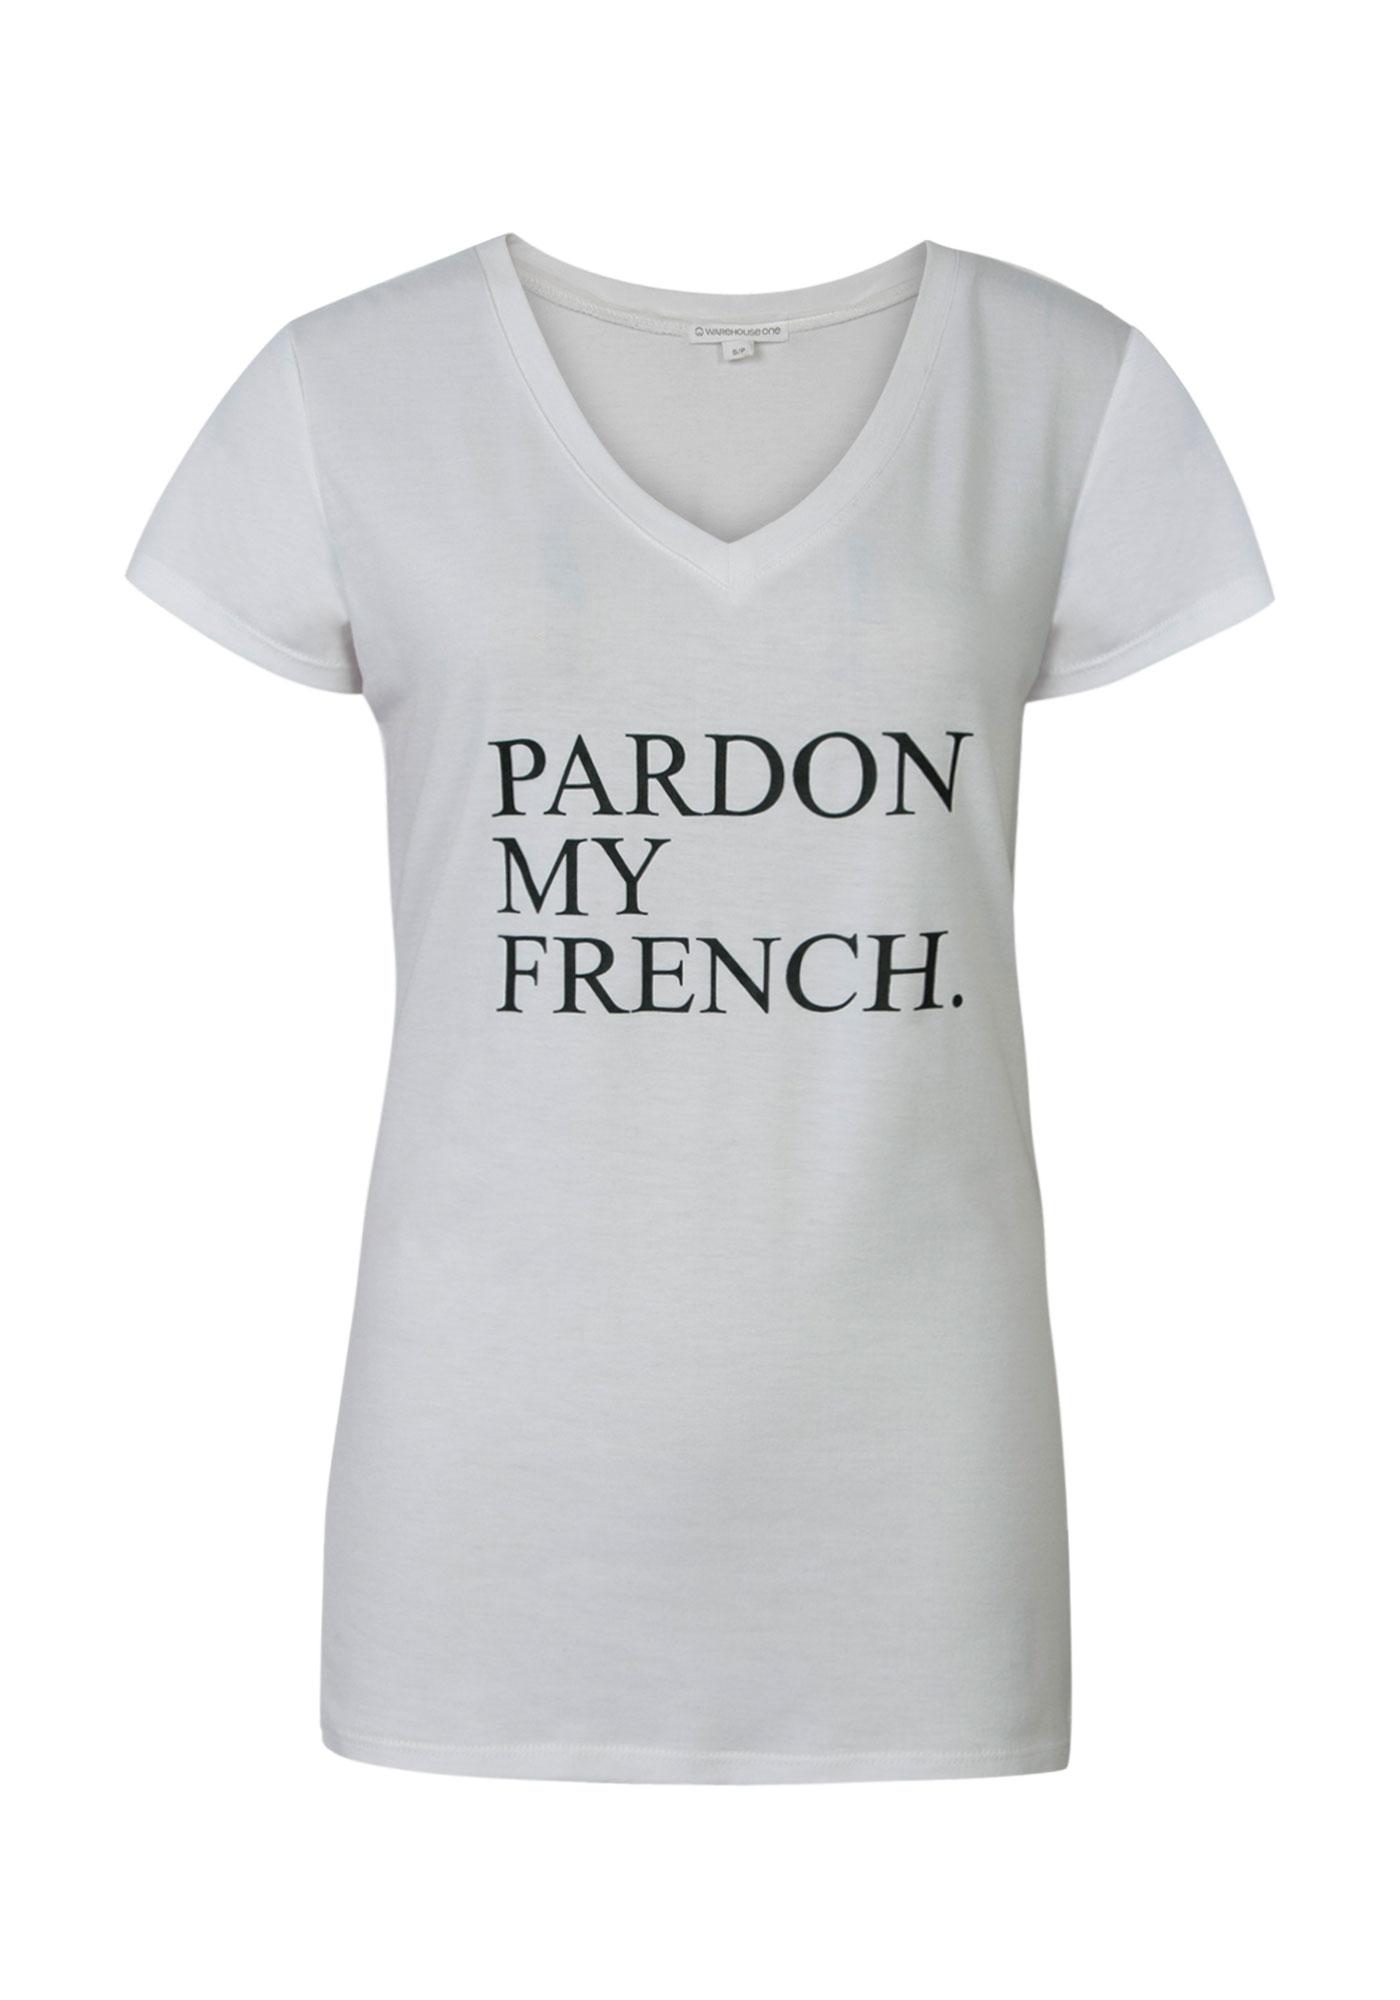 0c2f96c1 Ladies Pardon My French Graphic Tee, WHITE, hi-res ...